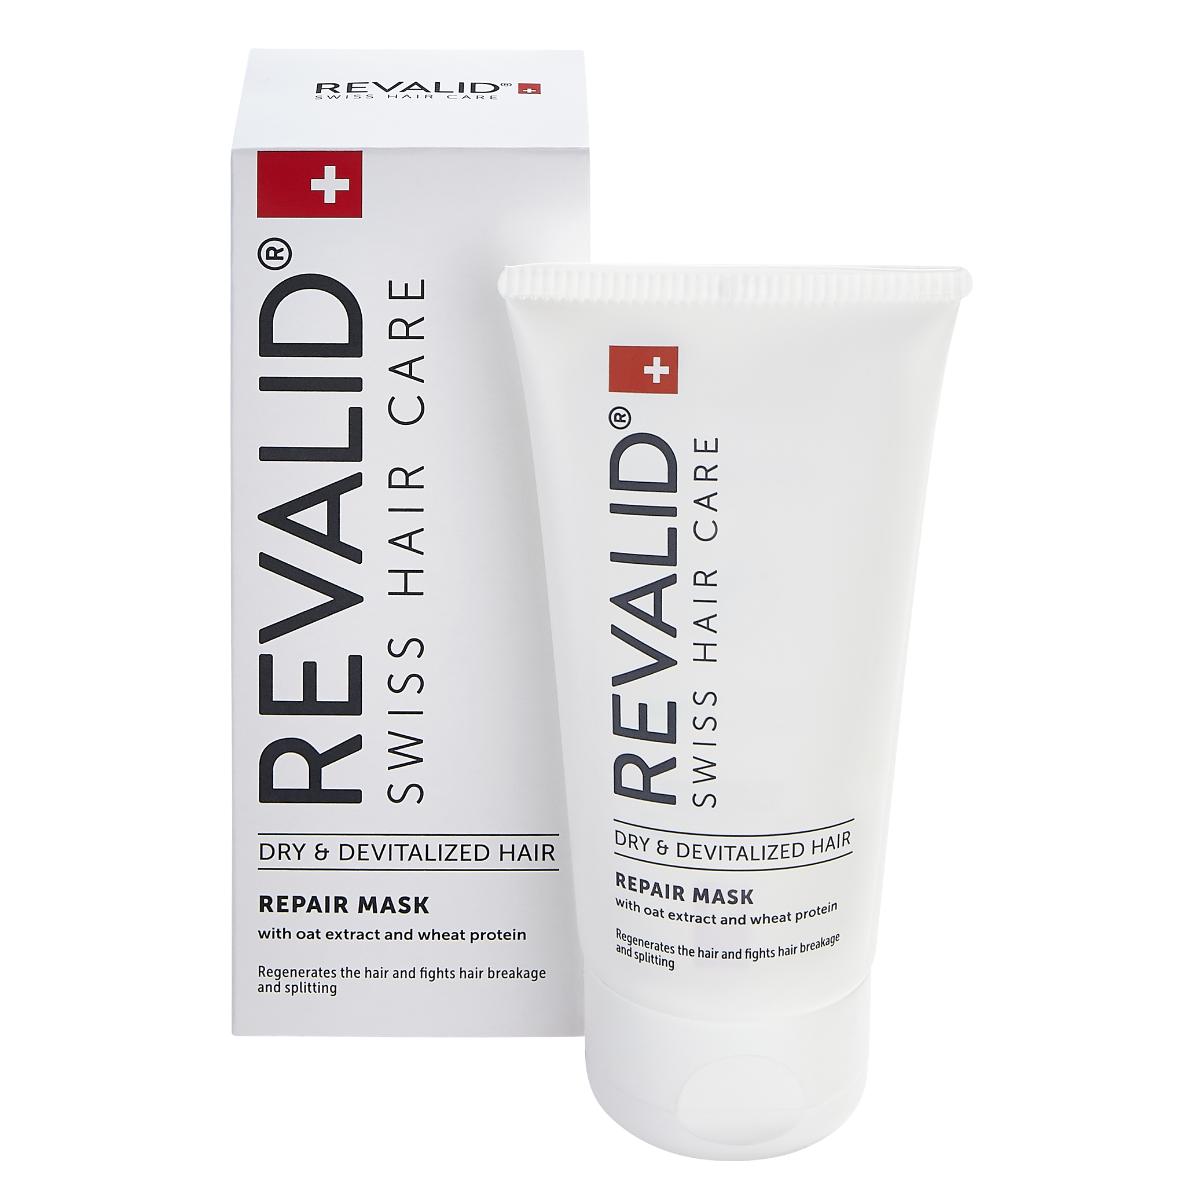 Masca reparatoare Revalid, 150ml, Ewopharma imagine produs 2021